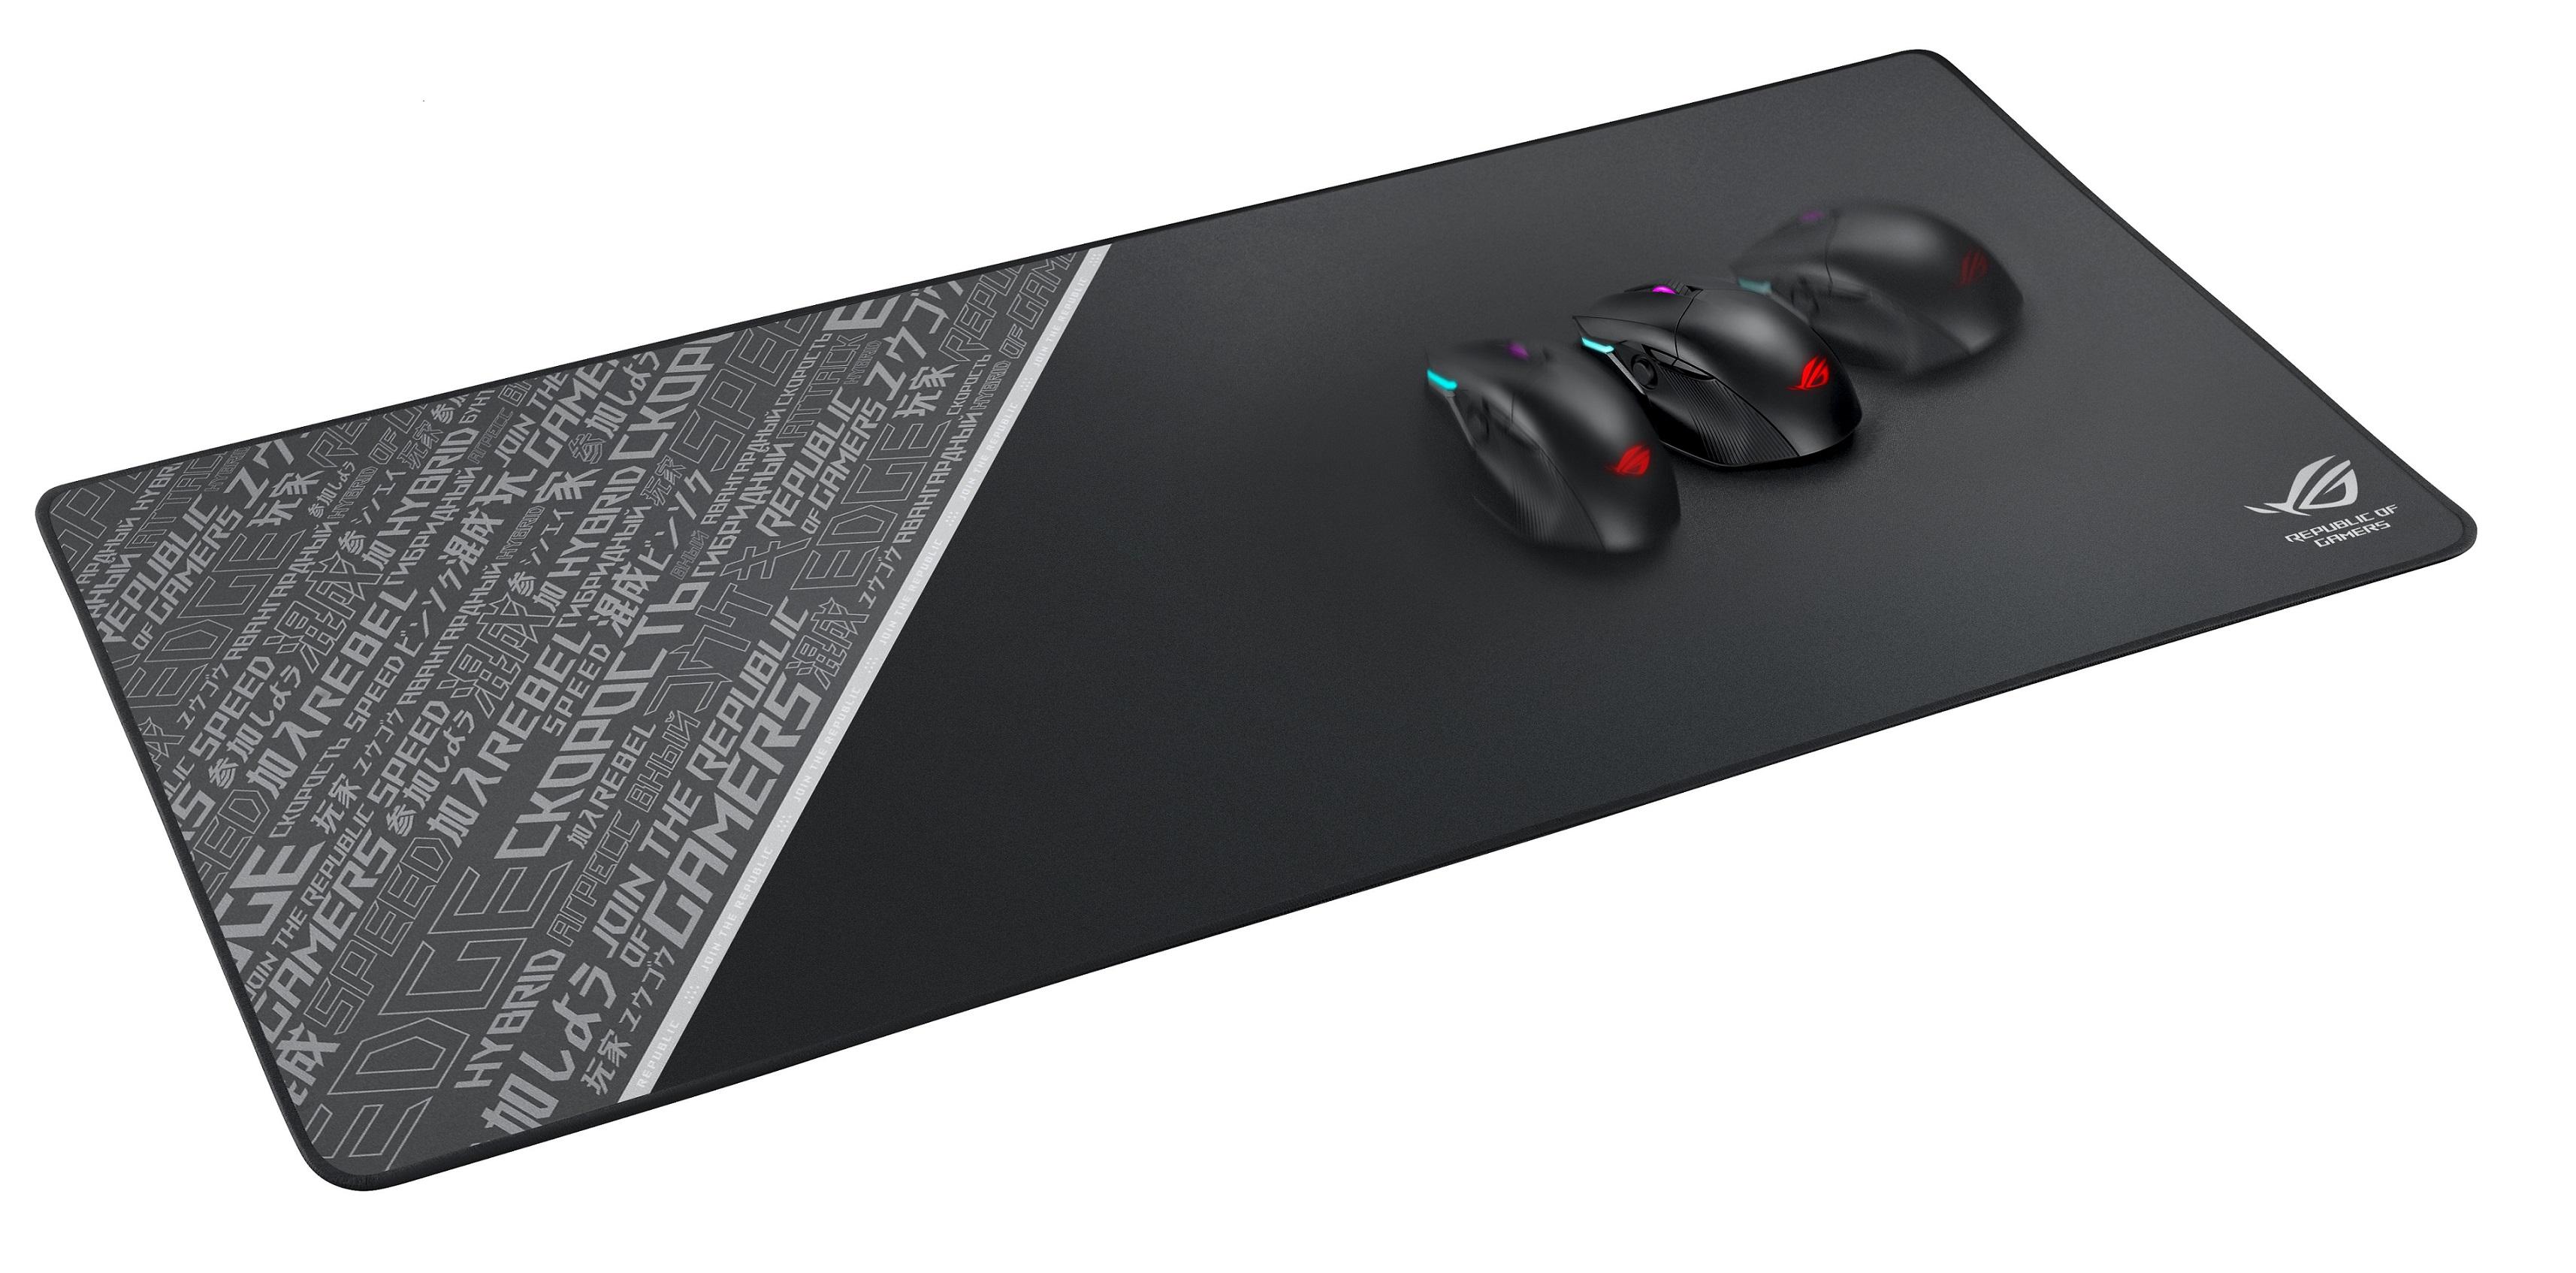 ROG Sheath BLK LTD是一款為滿足各類型滑鼠而打造的滑鼠墊,擁有900mm X 440mm的超大面積,可同時容納所有電競配備。